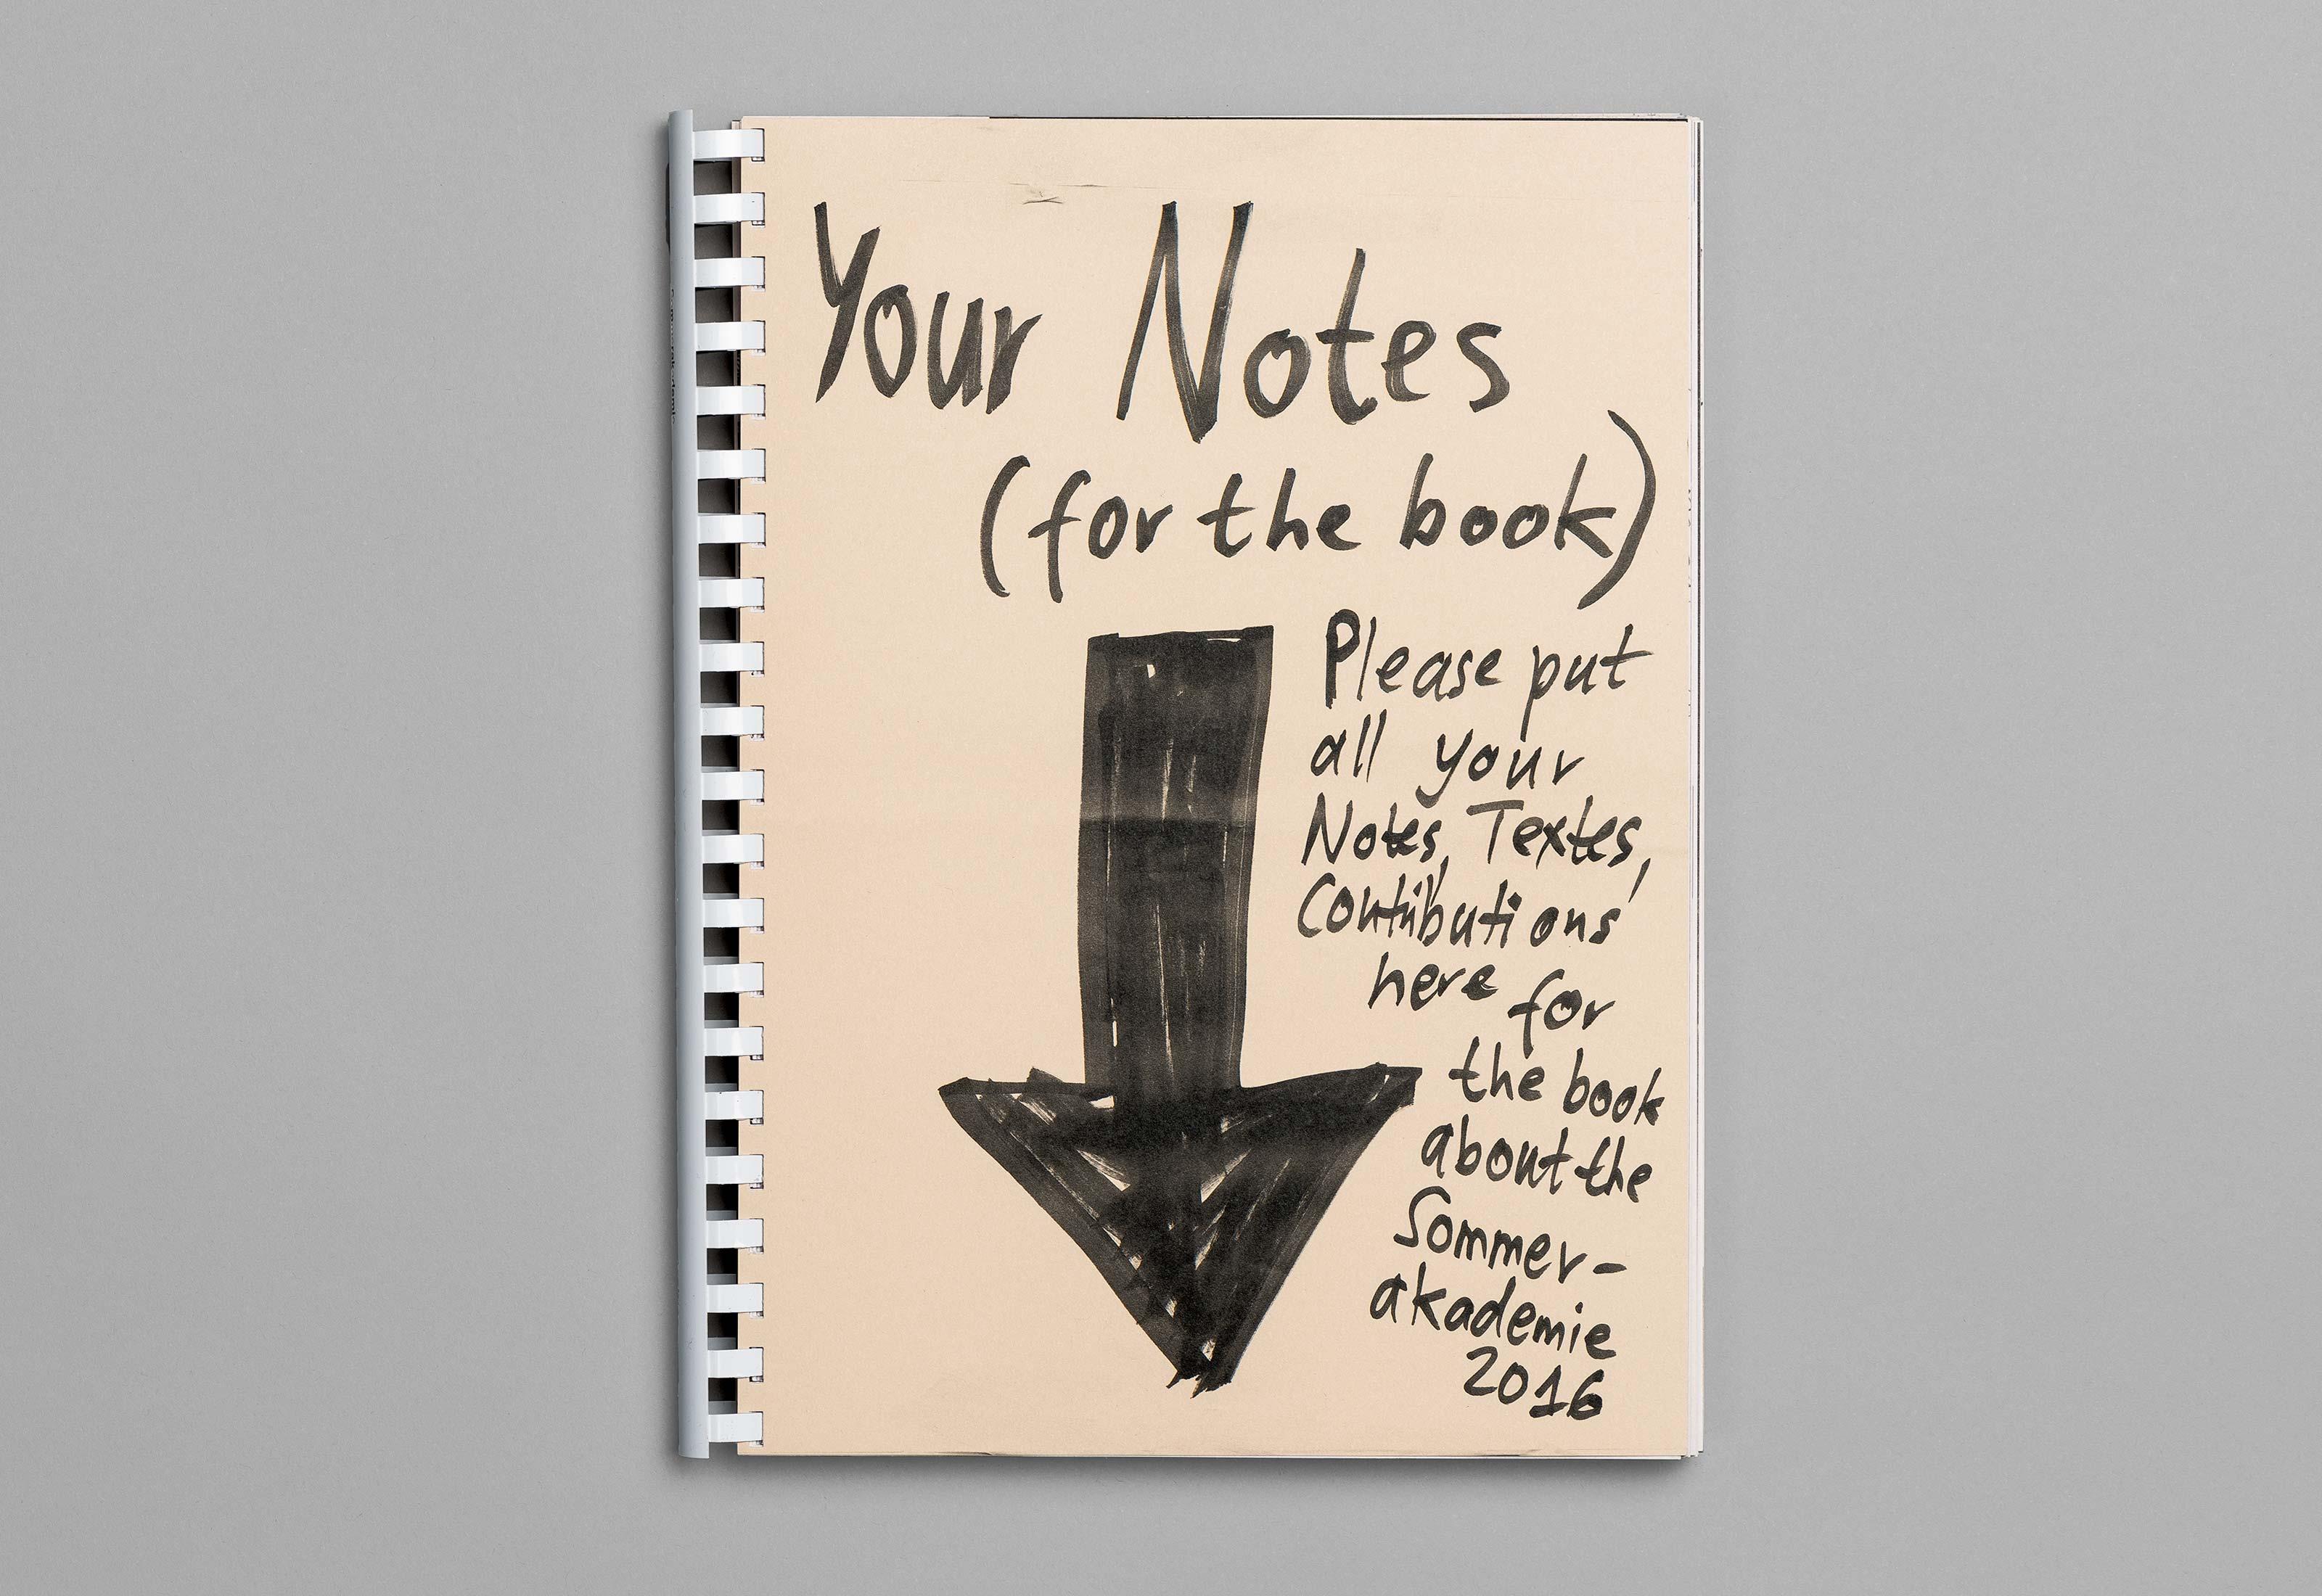 Sommerakademie im Zentrum Paul Klee 2016 – Publikation Thomas Hirschhorn, front  ©Atelier Pol